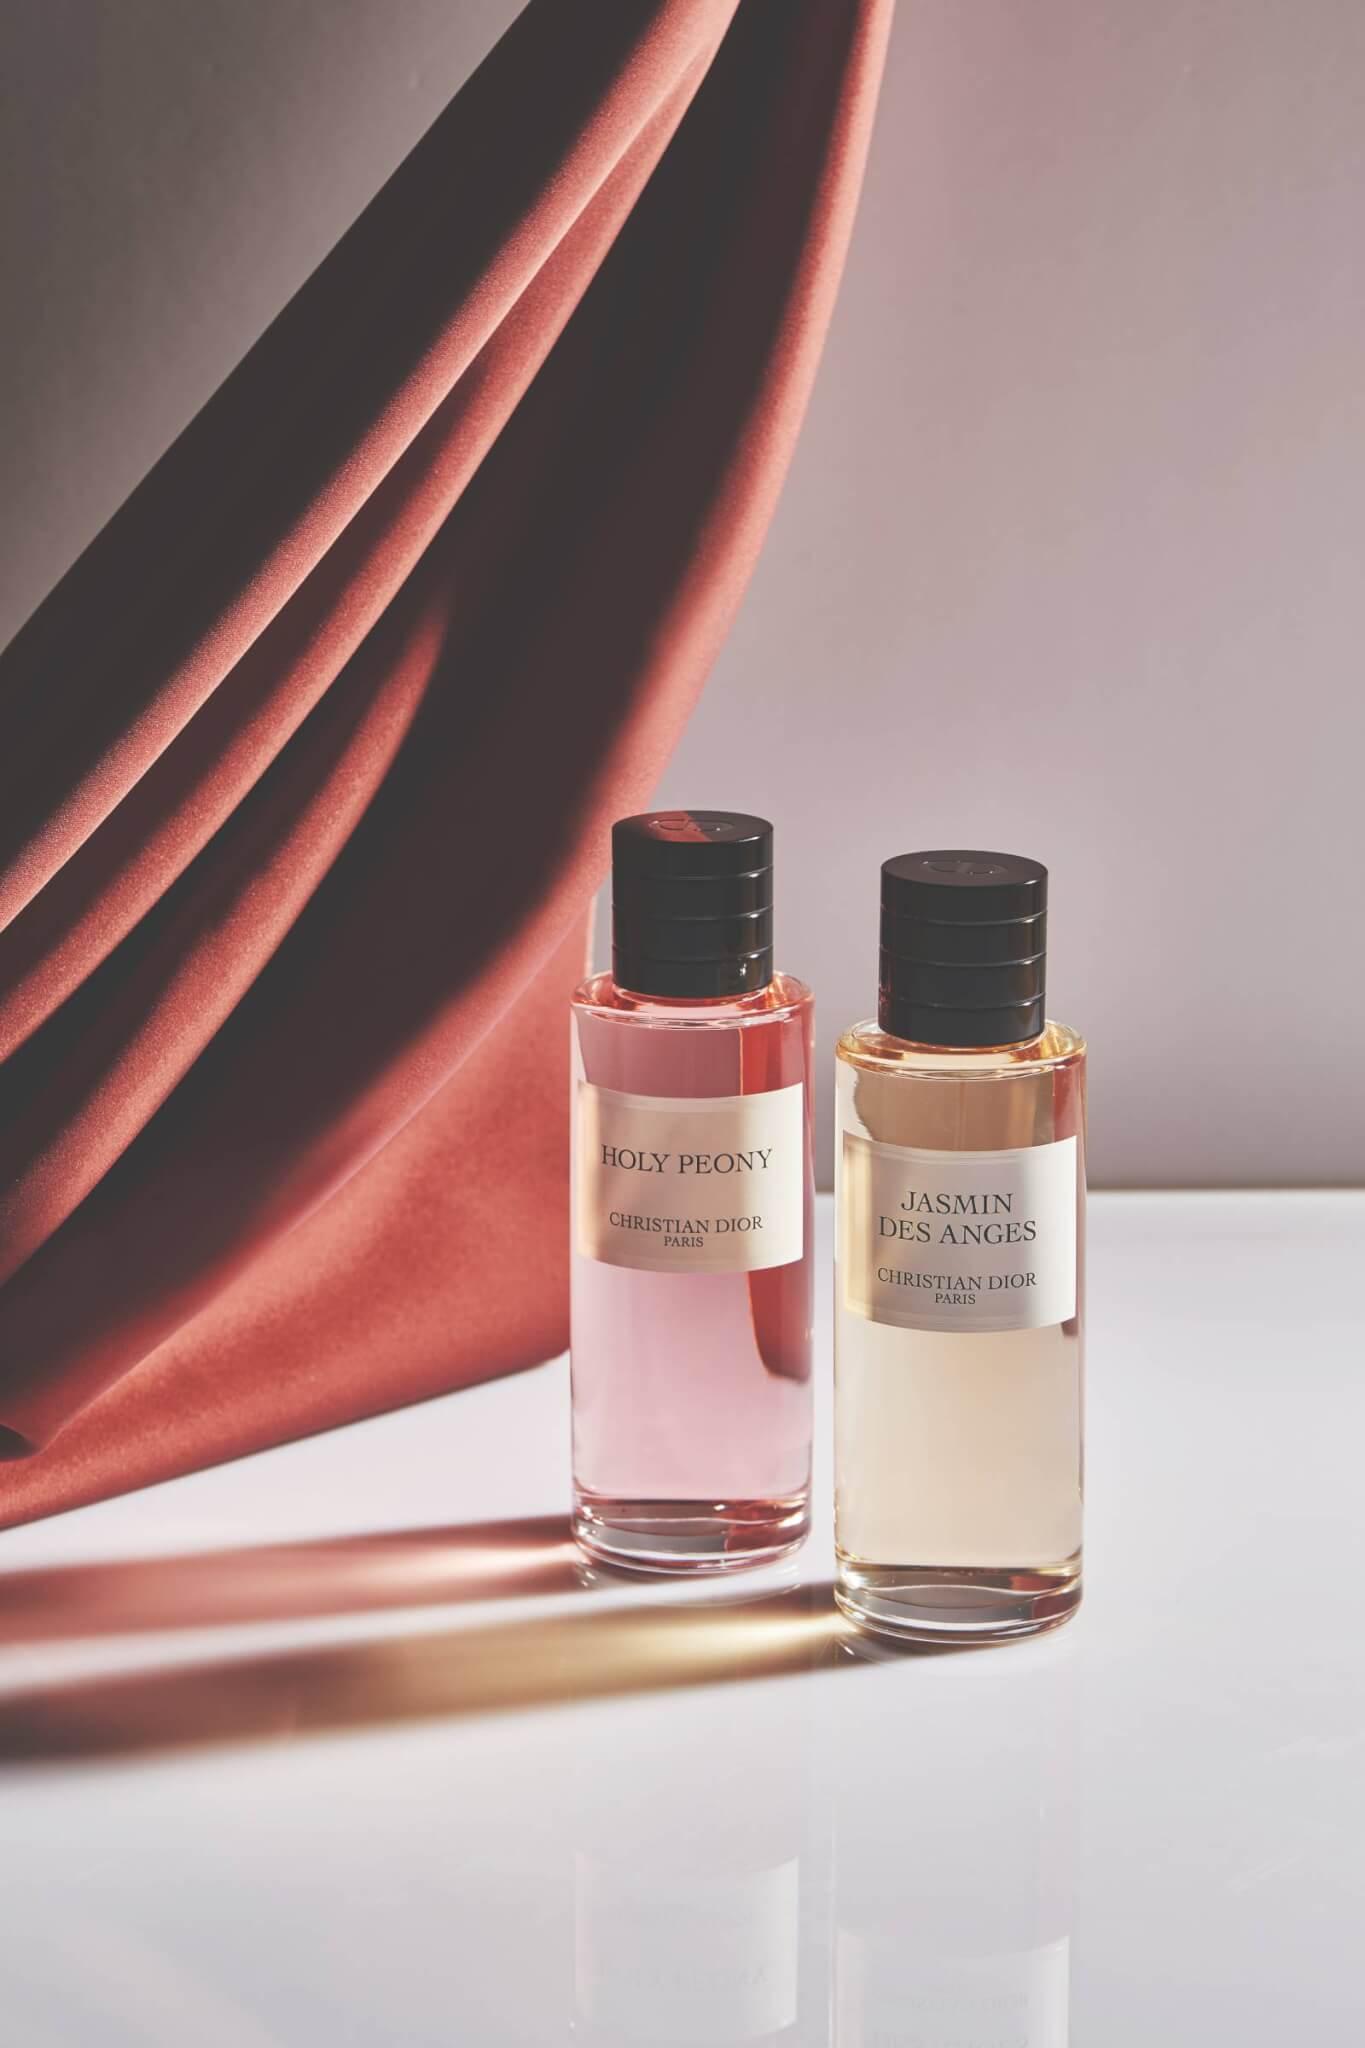 HOLY PEONY $740 JASMIN DES ANGES $740 Both fragrance spray BY CHRISTIAN DIOR